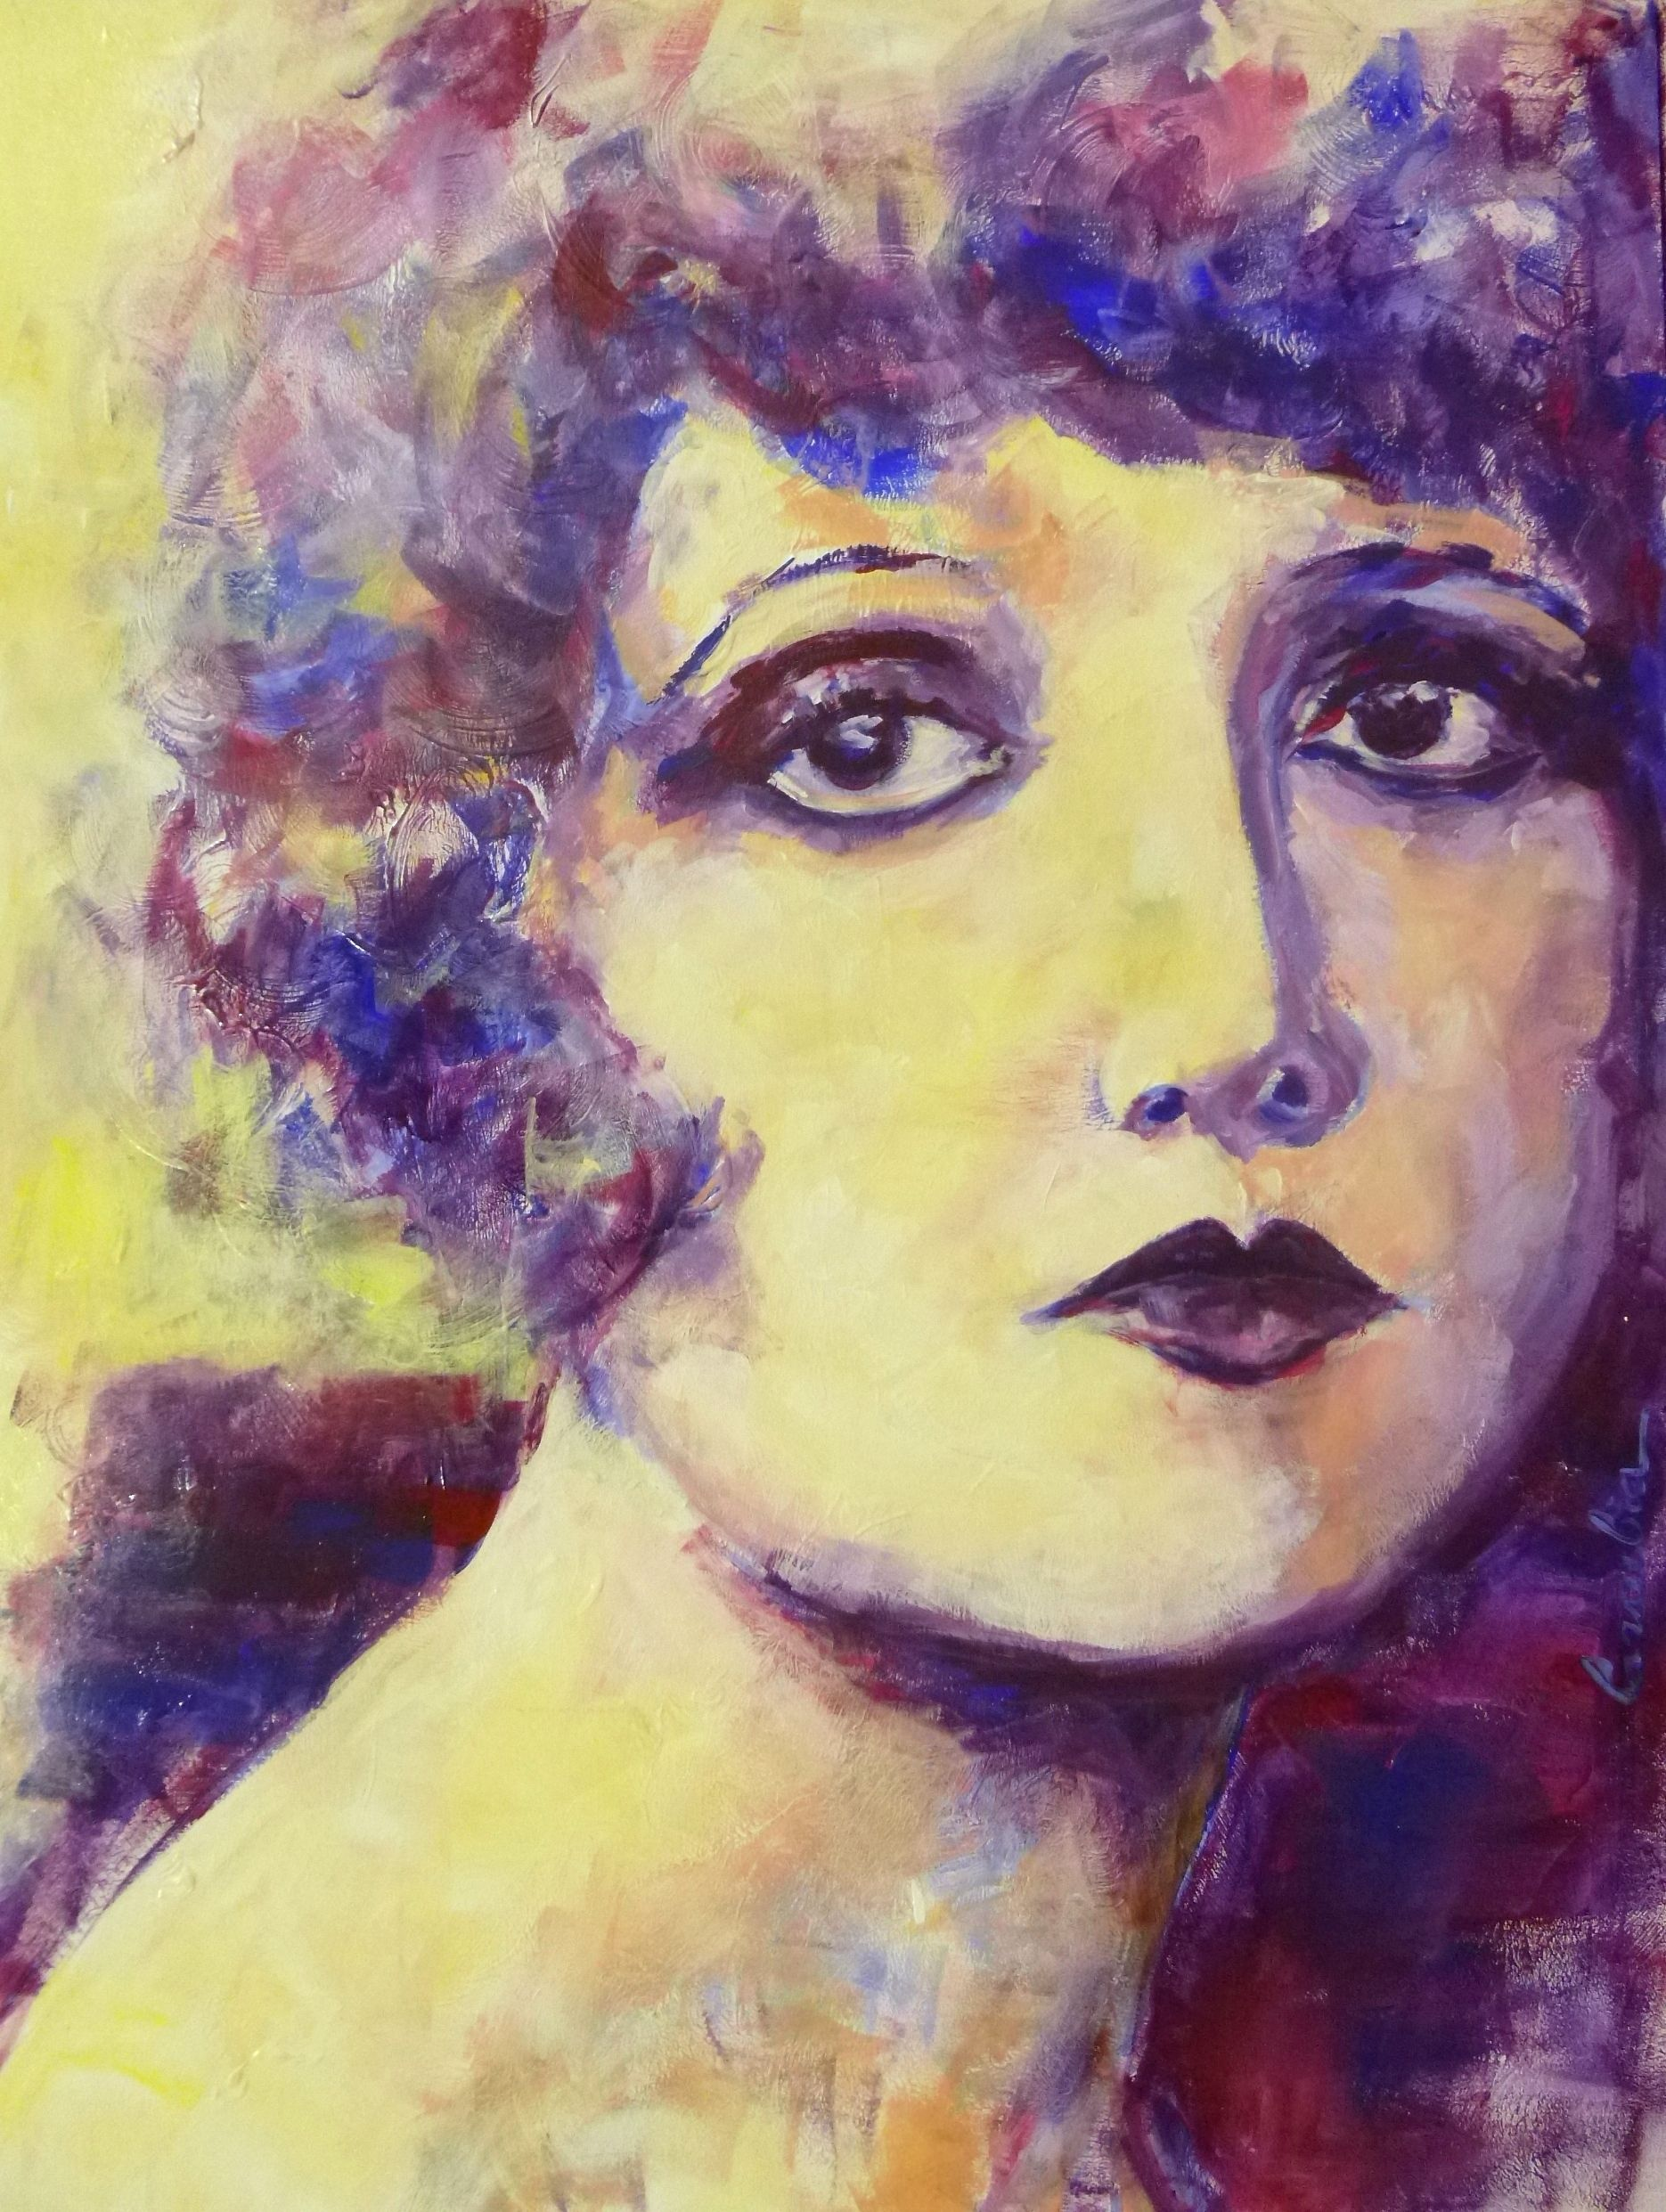 Clara Bow by Angela Larrubia 60x80cm - Acrilyc on panel. 20's